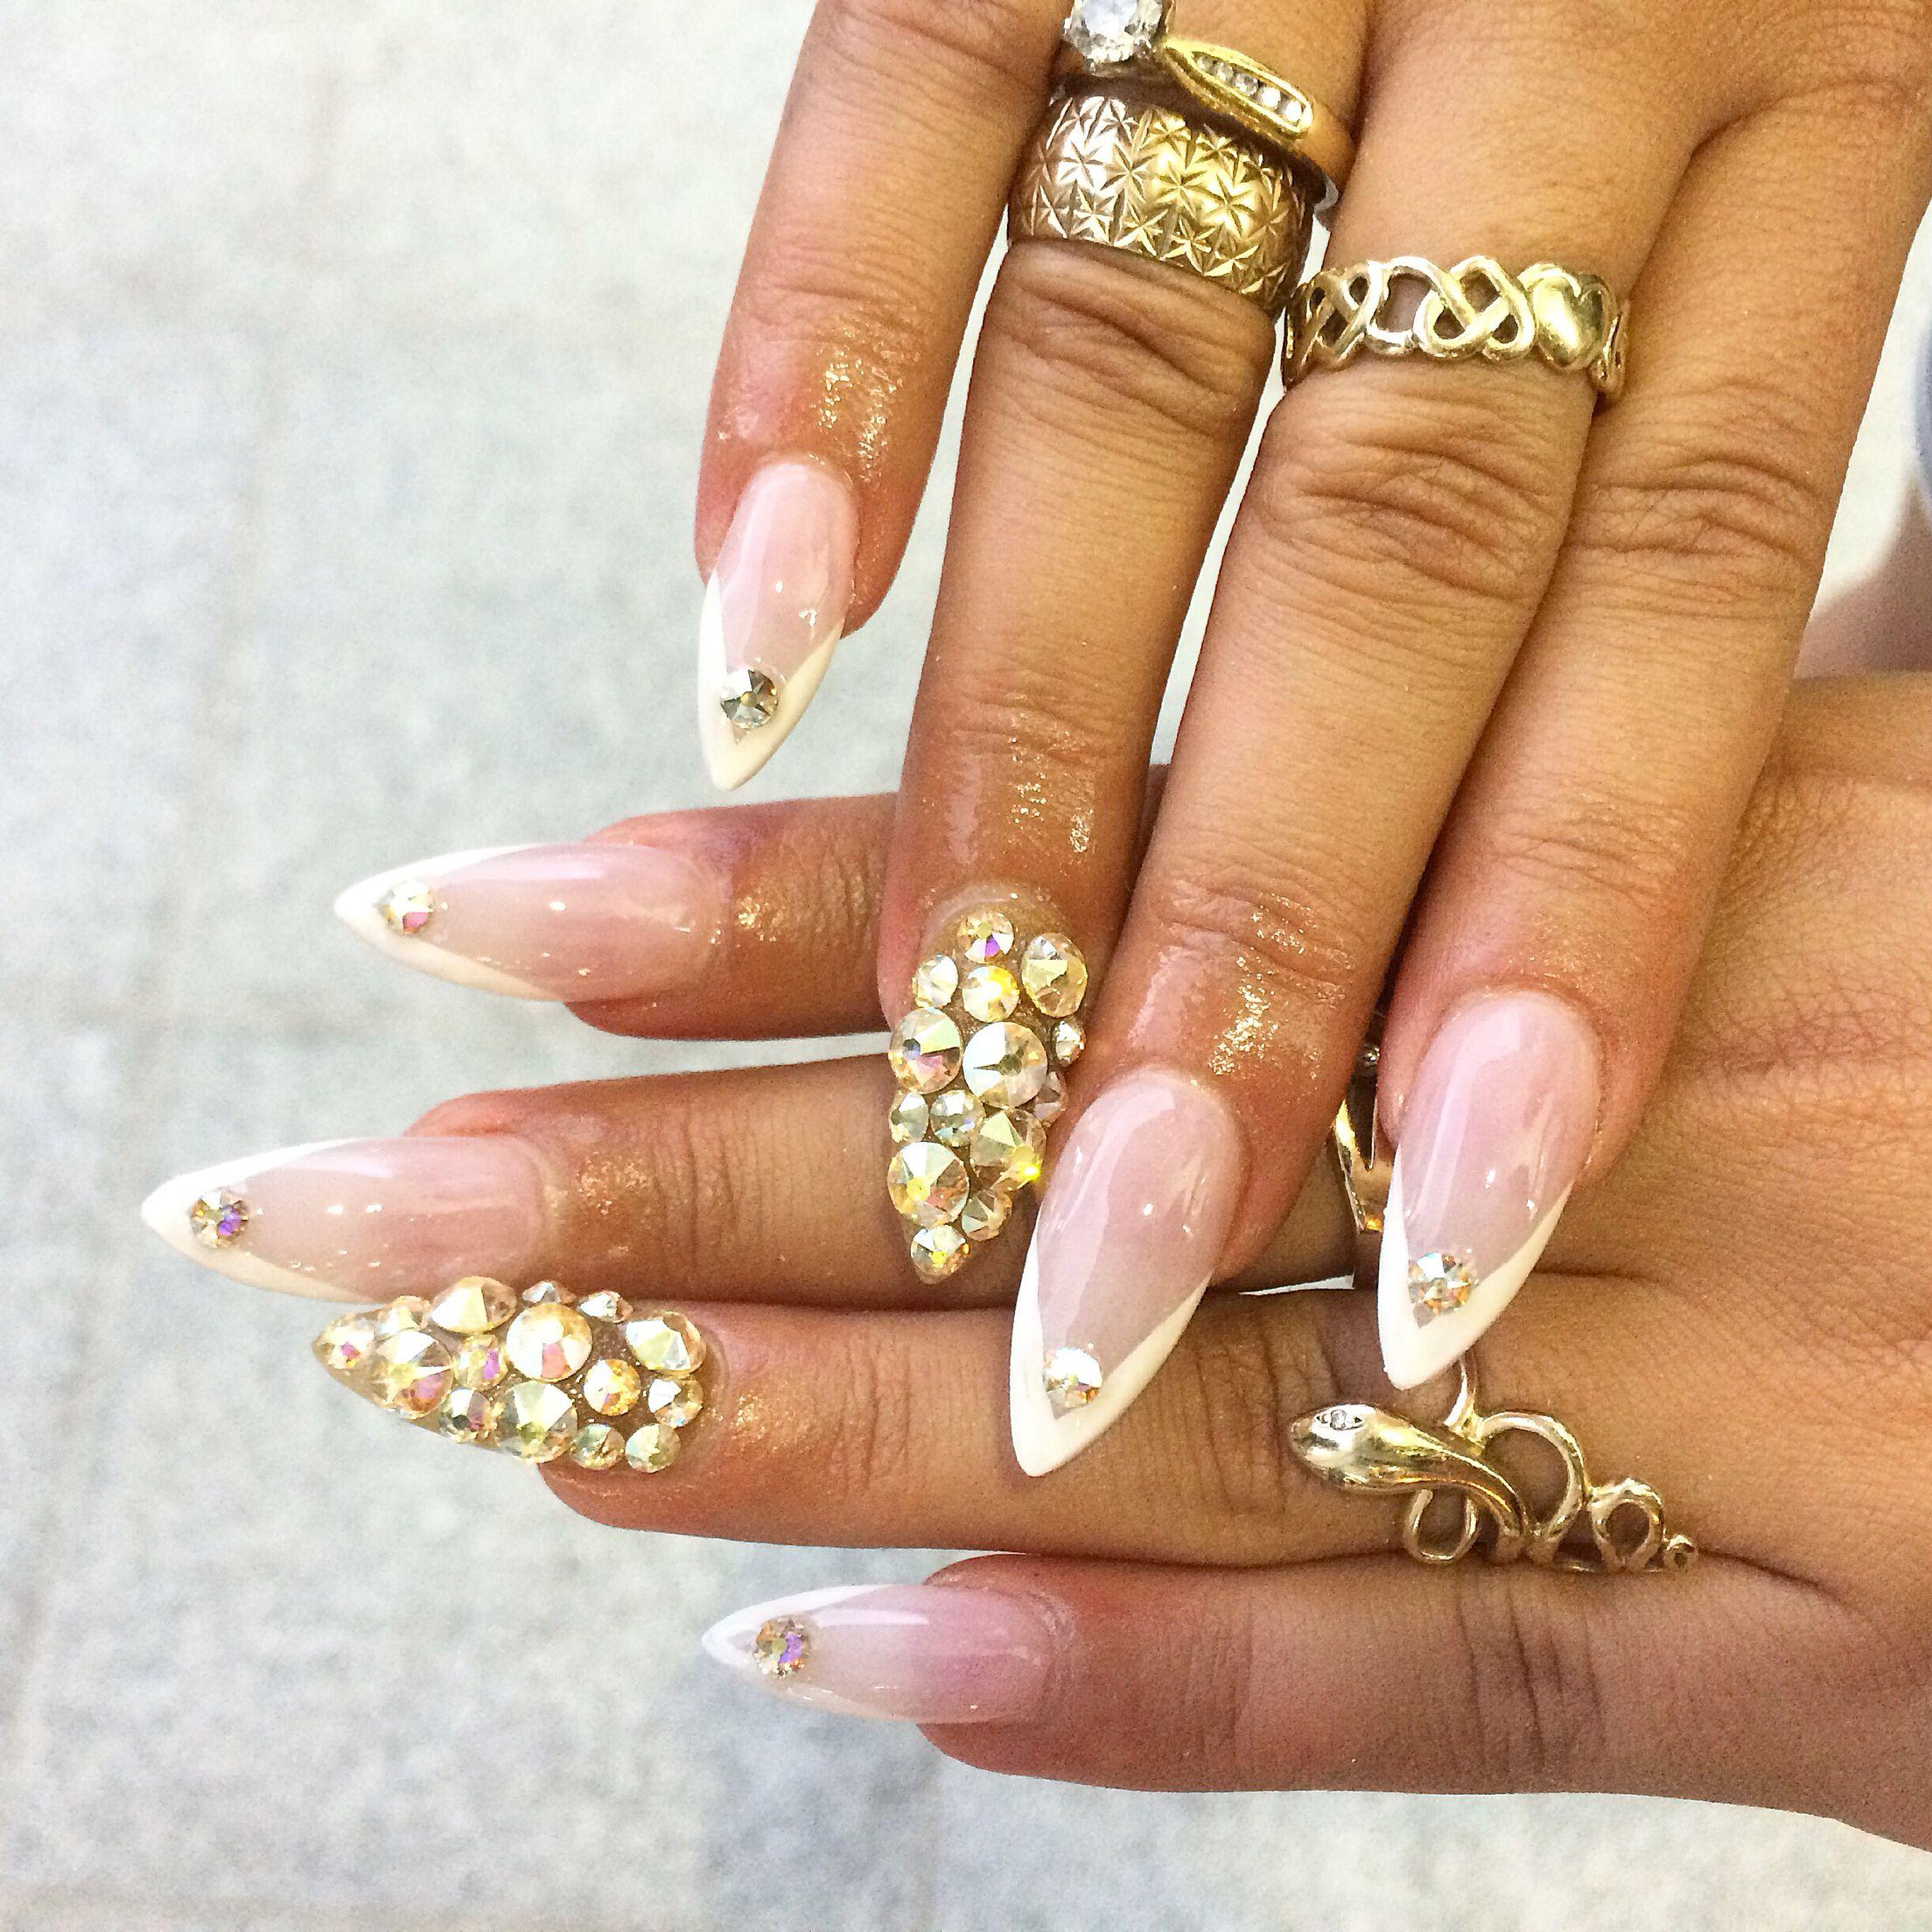 Ṿ French tip stiletto nails   Nails   Pinterest   OPI and Nail nail